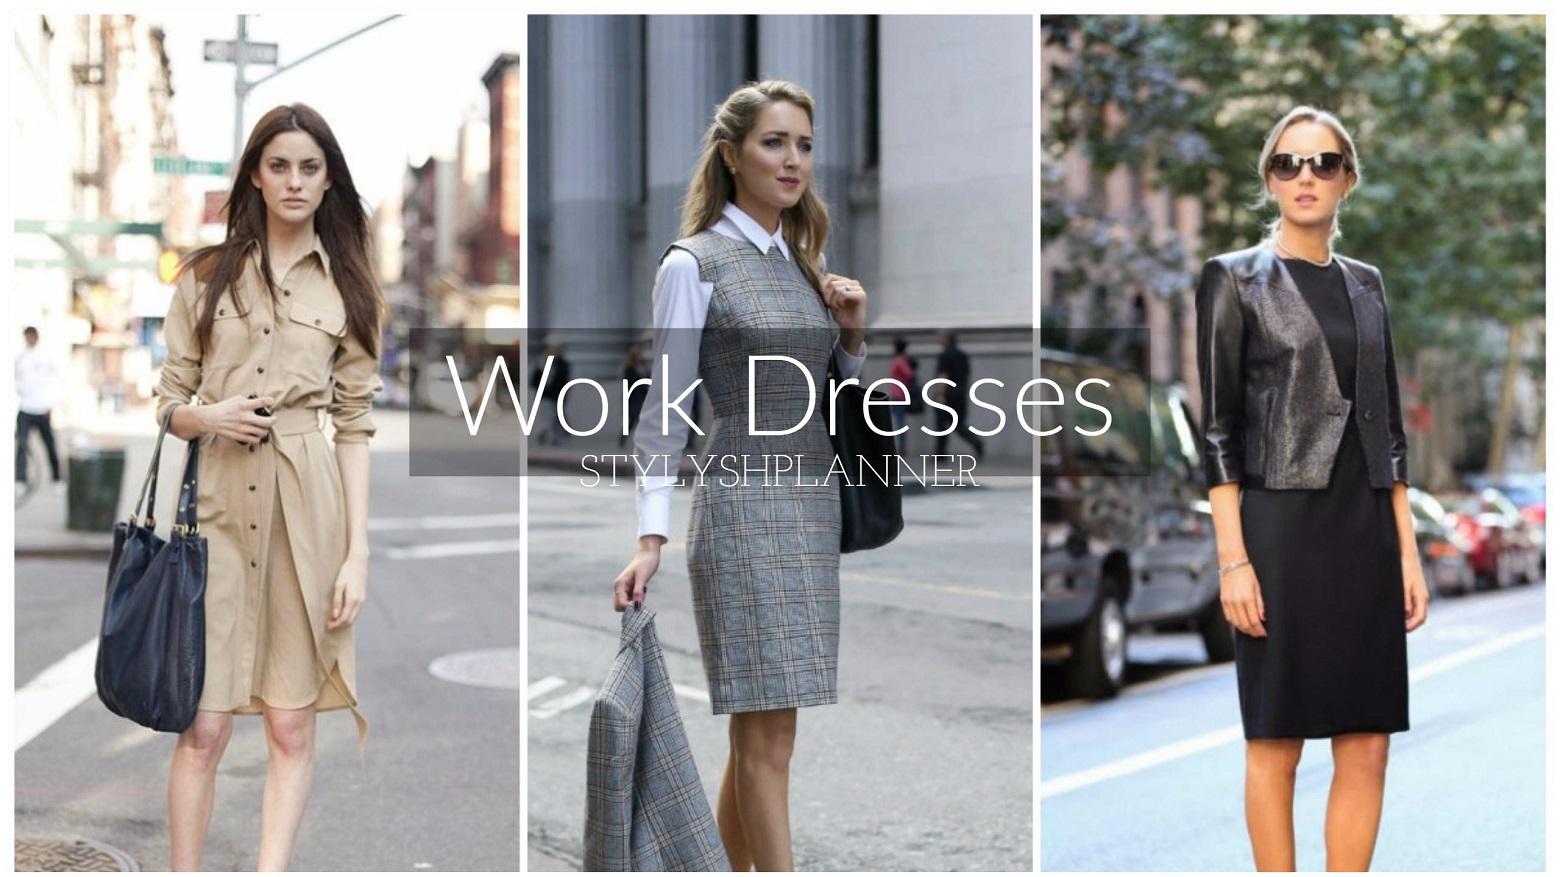 Work Dresses